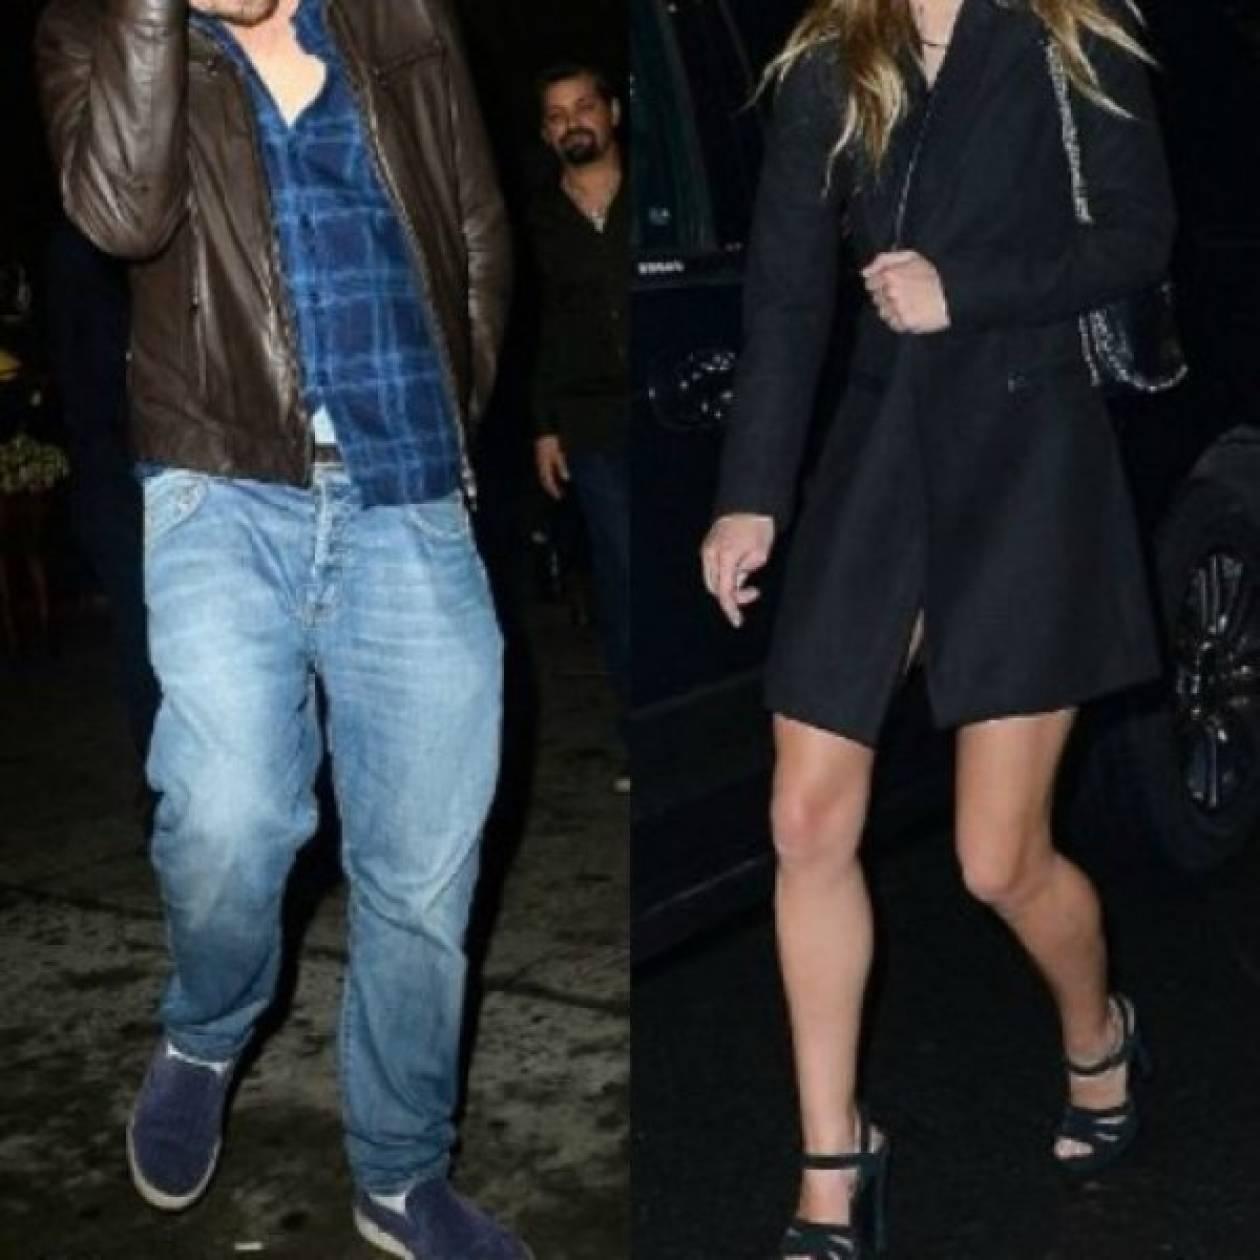 Nέο, διάσημο και παράνομο ζεύγος; Ποιοι δεσμευμένοι star έφυγαν μαζί